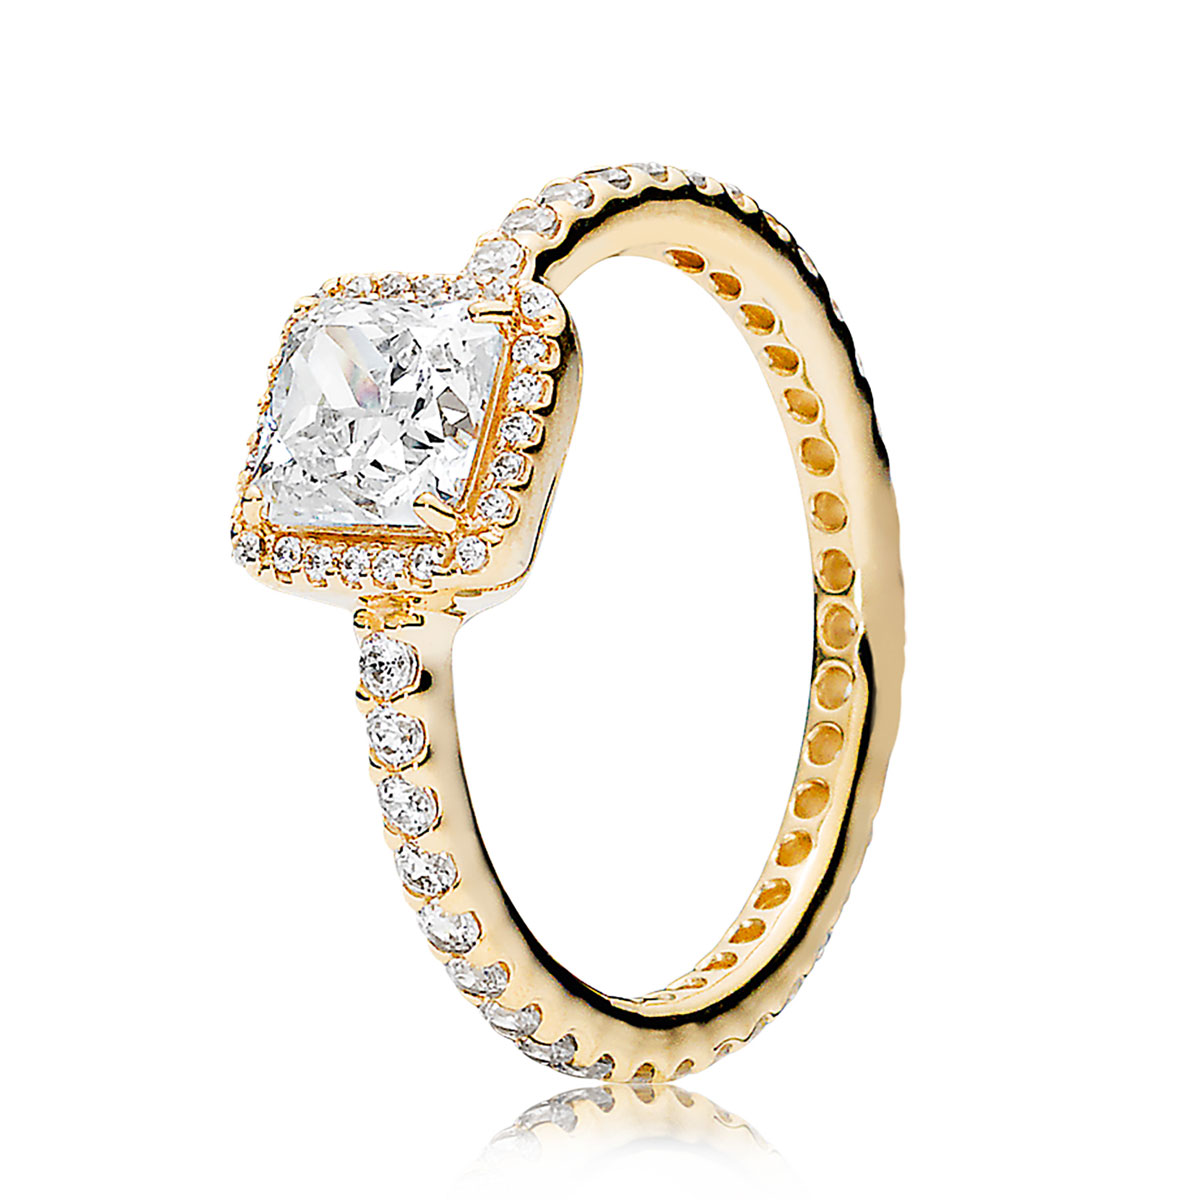 7145b02e0 PANDORA Timeless Elegance, 14K Gold & Clear CZ Ring ...